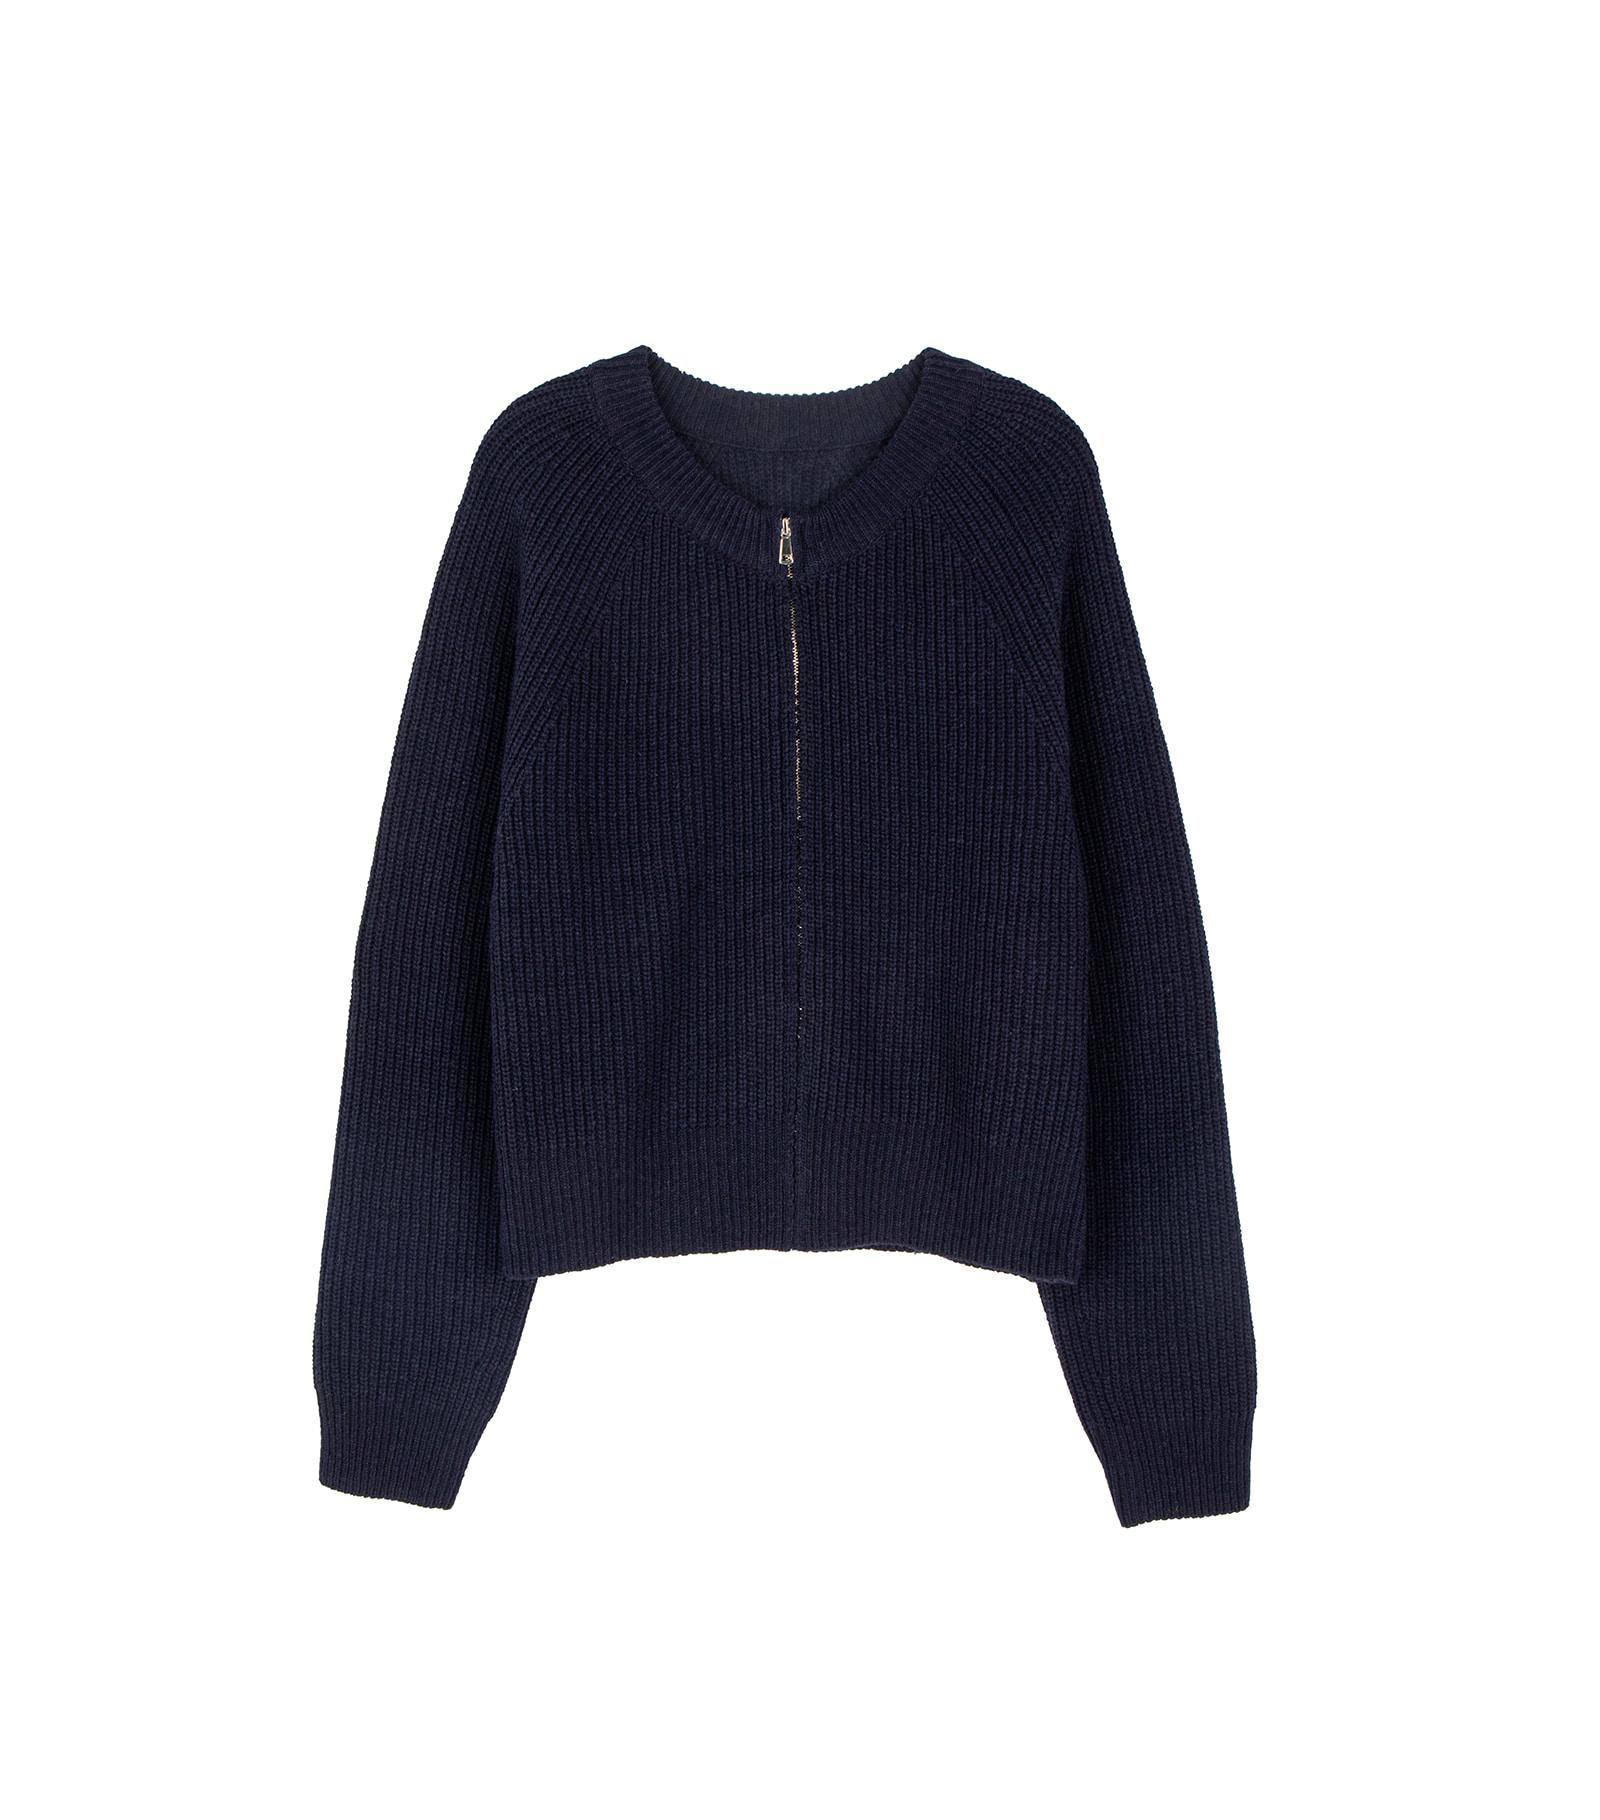 Northel zip-up knit cardigan